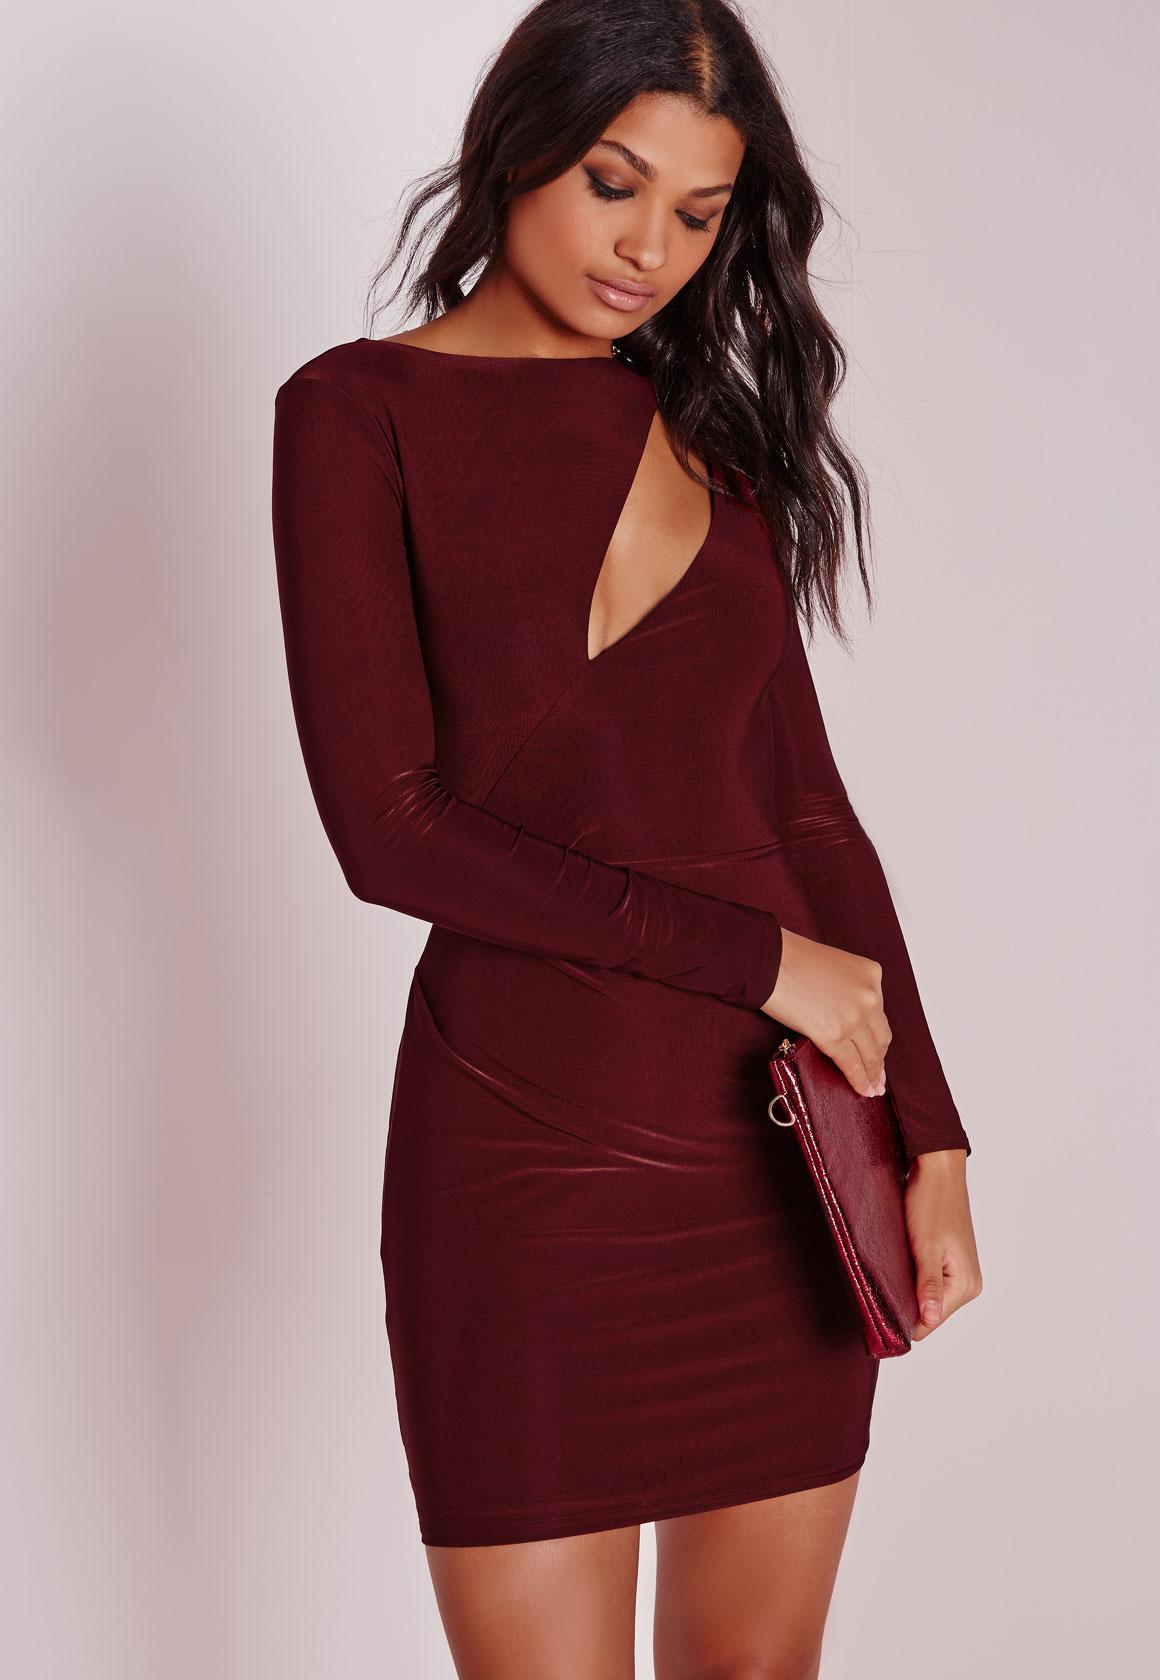 Burgundy Long Sleeve Bodycon Dress | Ejn Dress